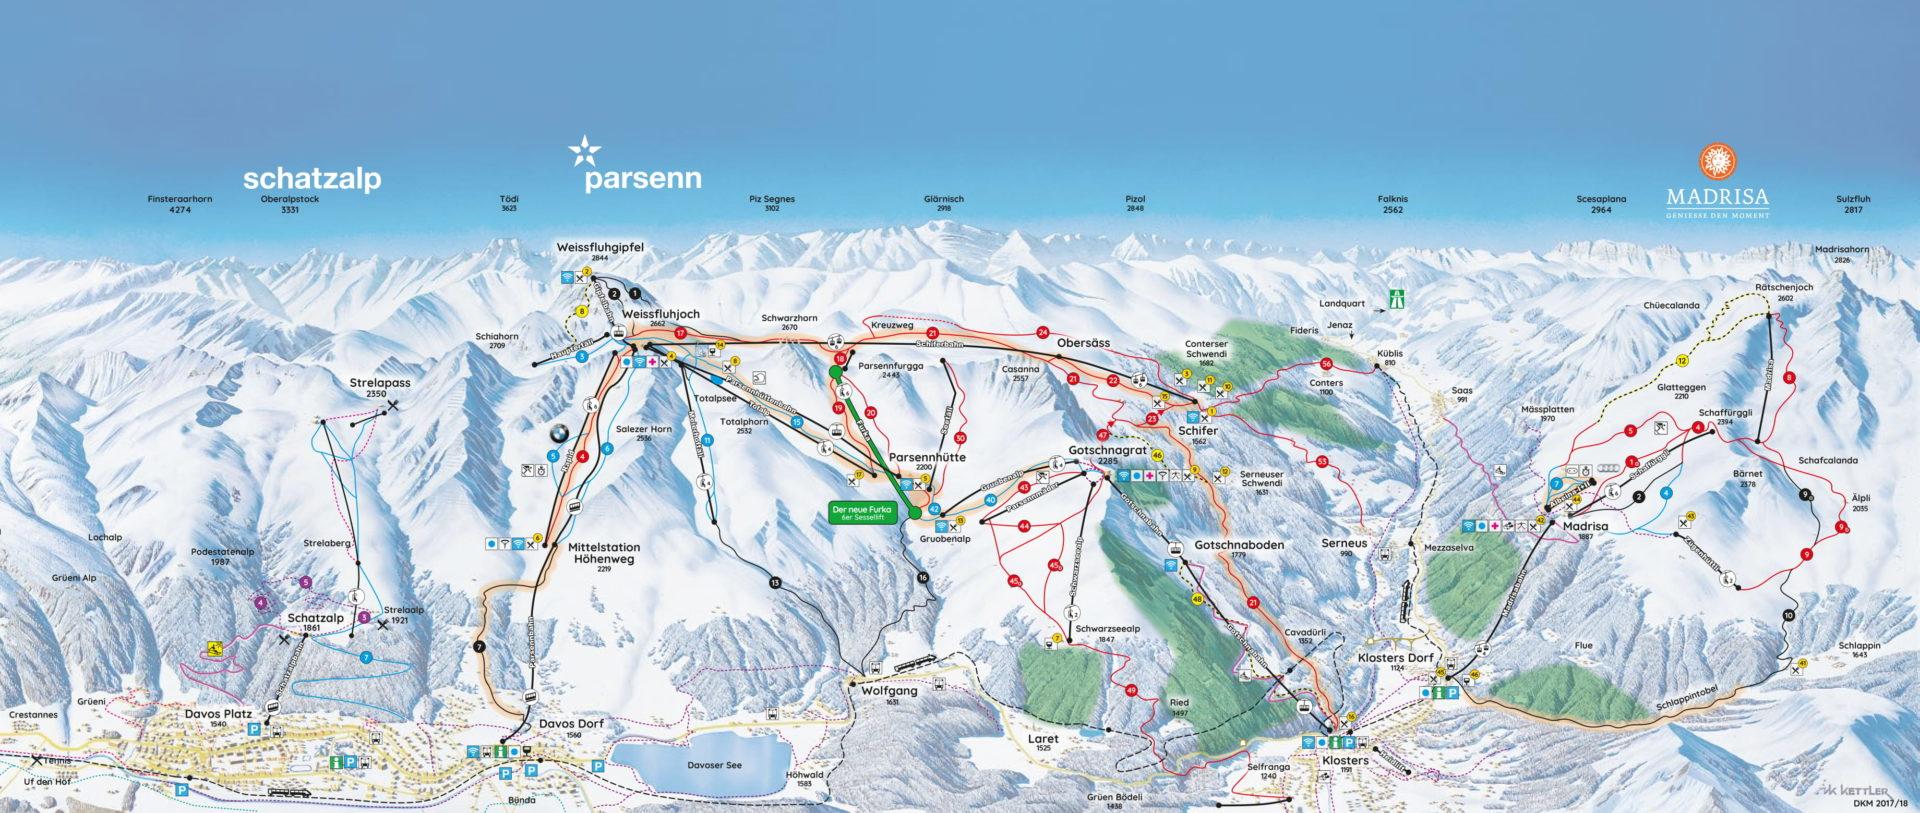 Pisteplattegrond Davos Klosters Mountain Zwitserland wintersport skivakantie luxe